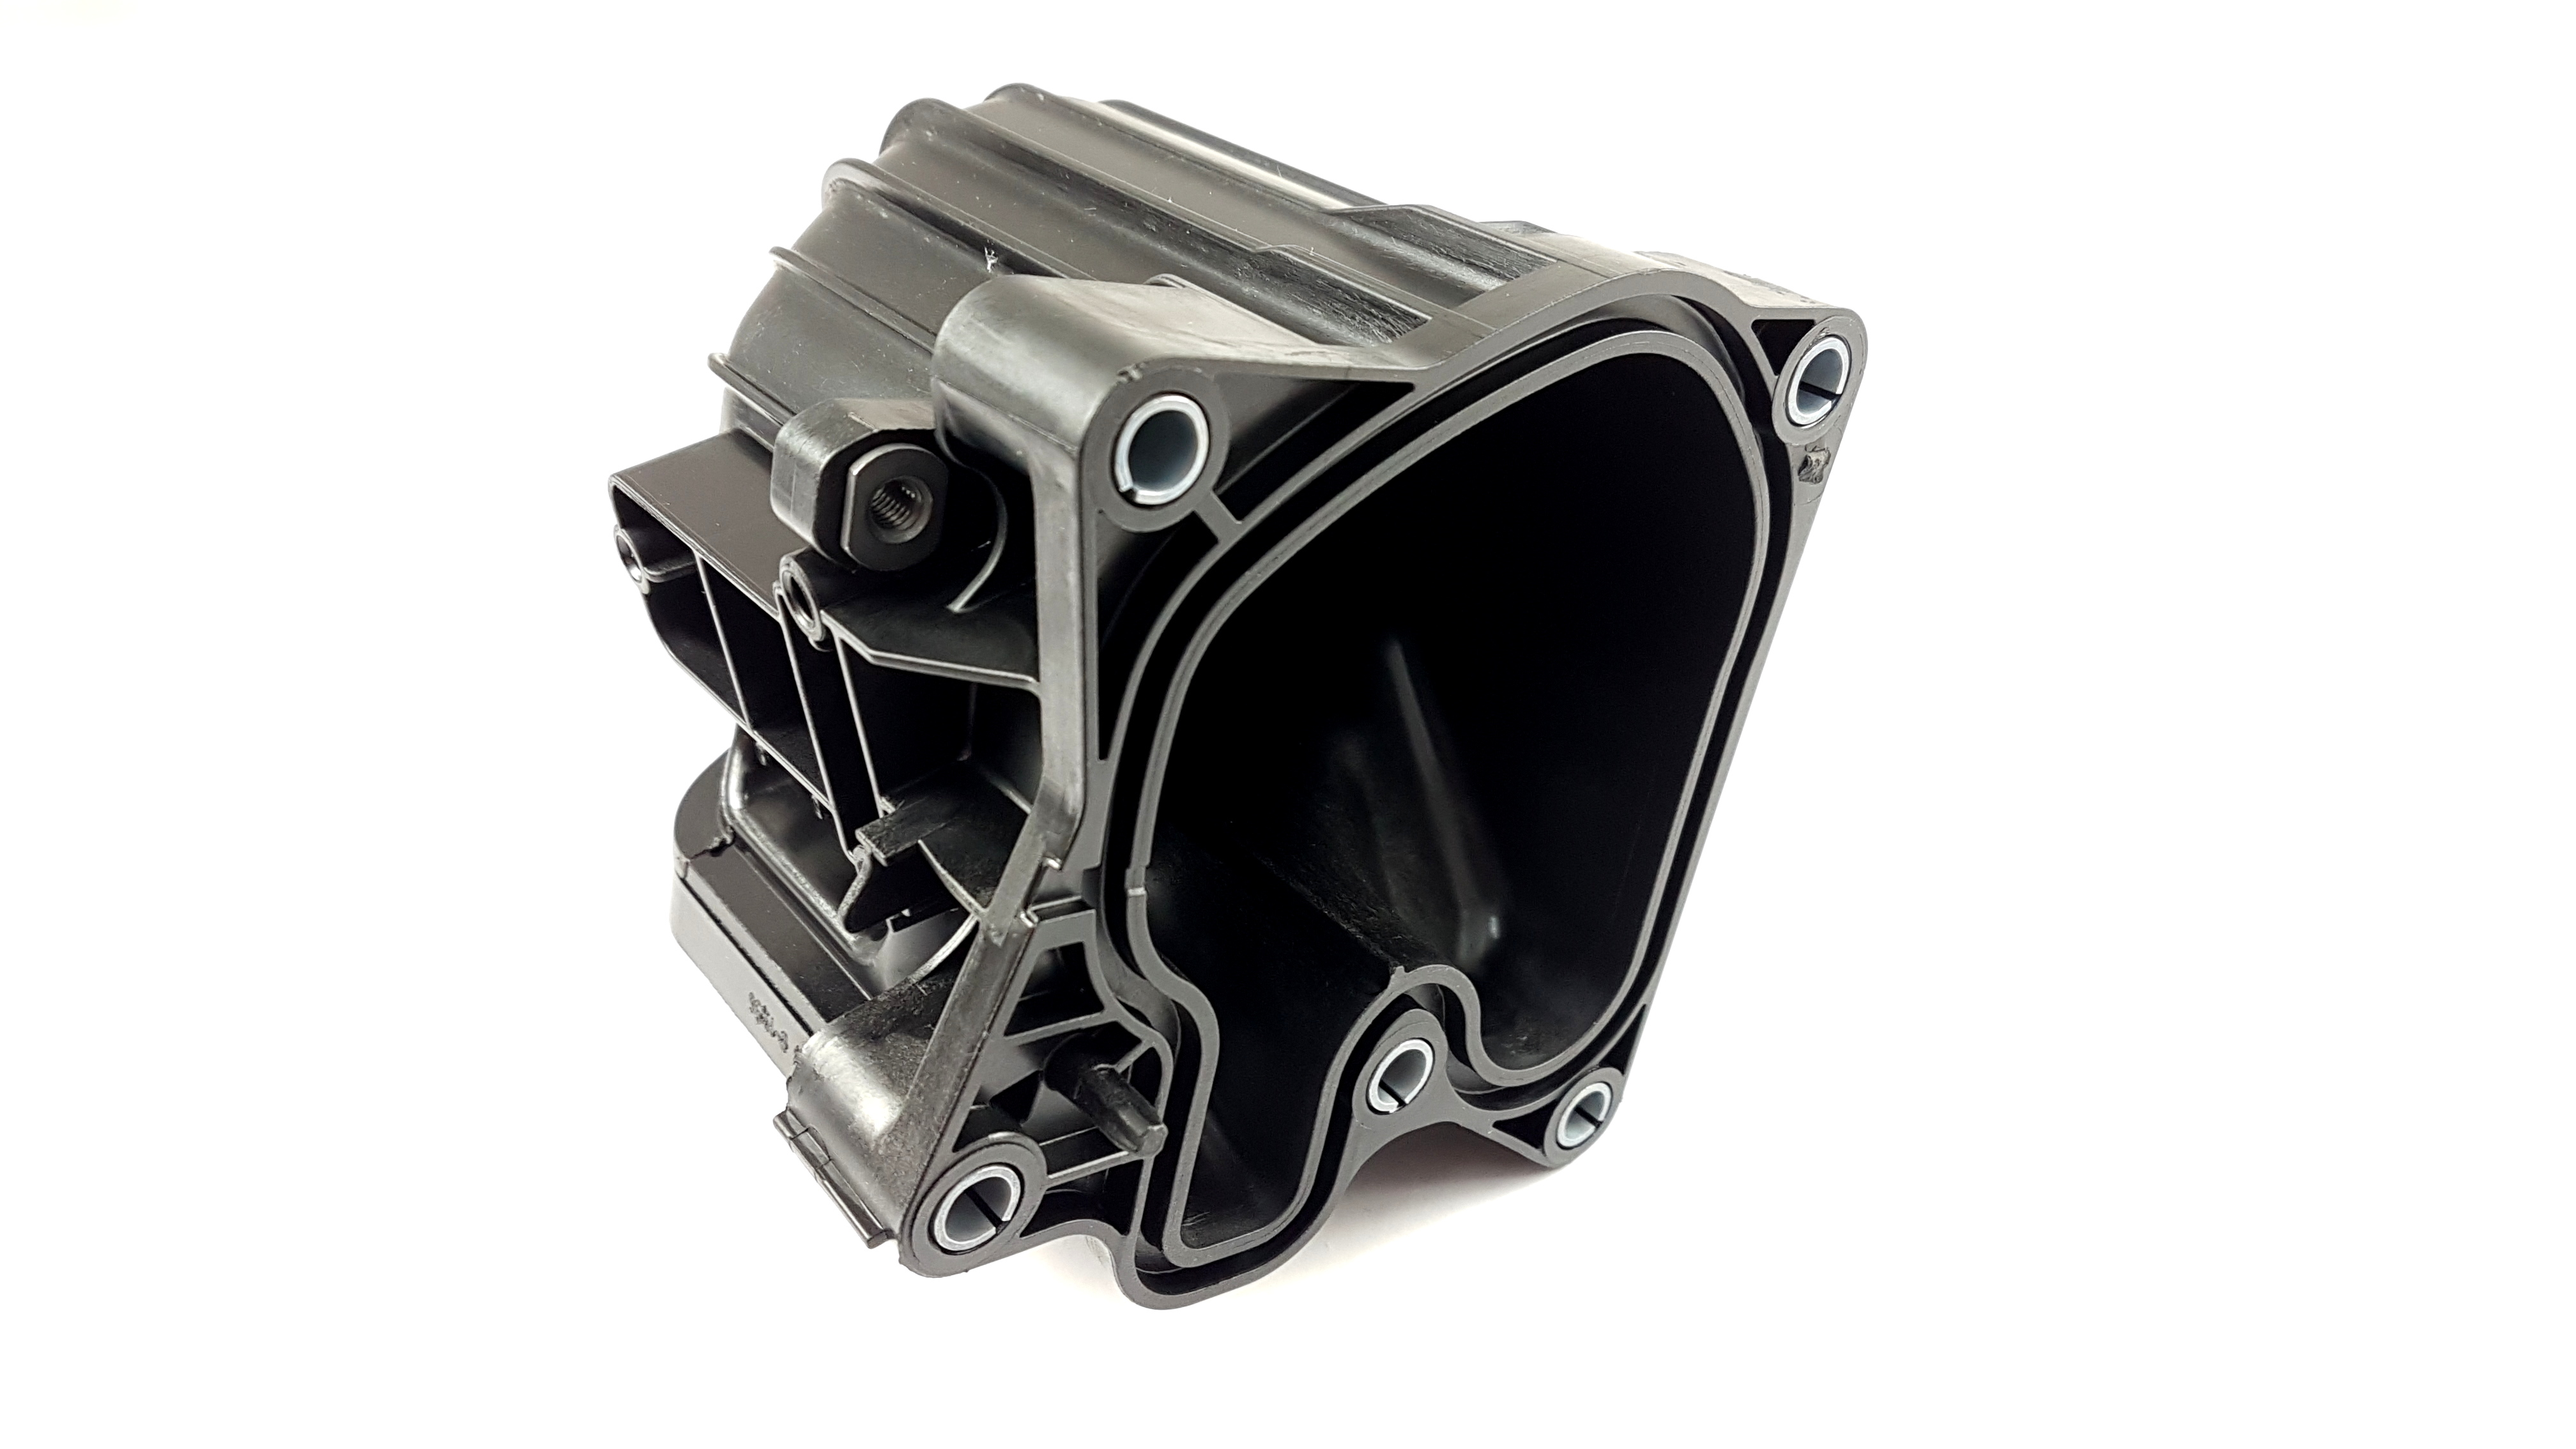 VAUXHALL ASTRA 2.0 DIESEL ORIGINALE VALVOLA EGR Cooler Kit di riparazione 55590953